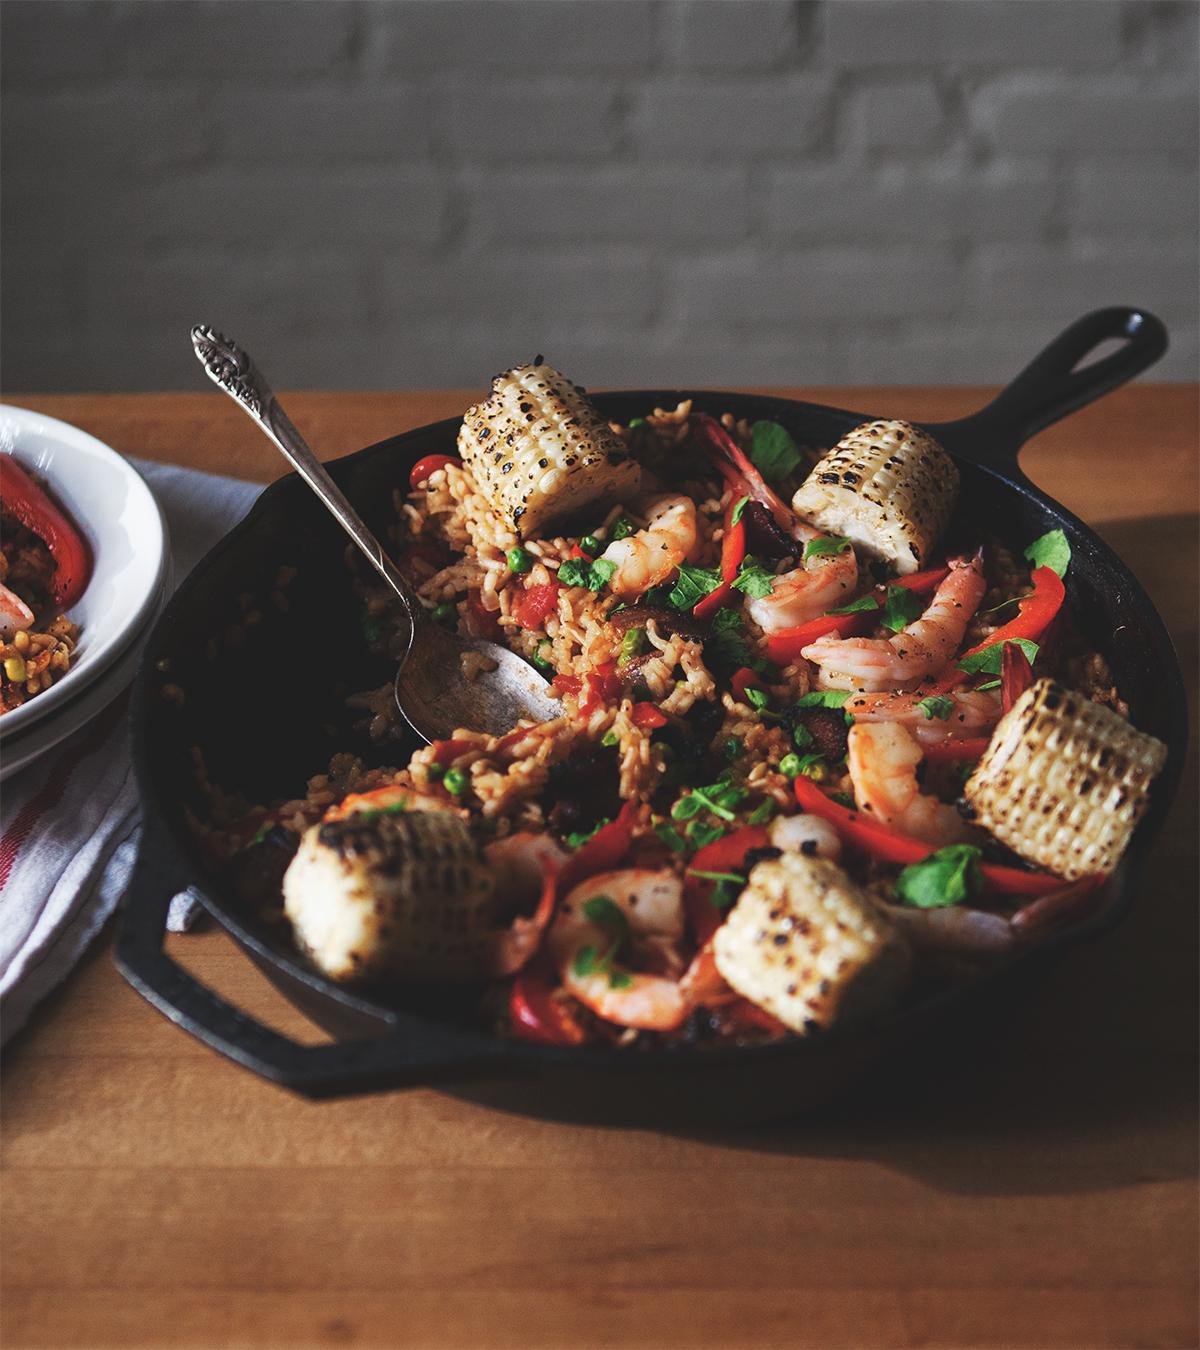 ABHSS_JG_Old-Bay-Shrimp-Paella-with-Charred-Corn-and-Bacon_13.jpg